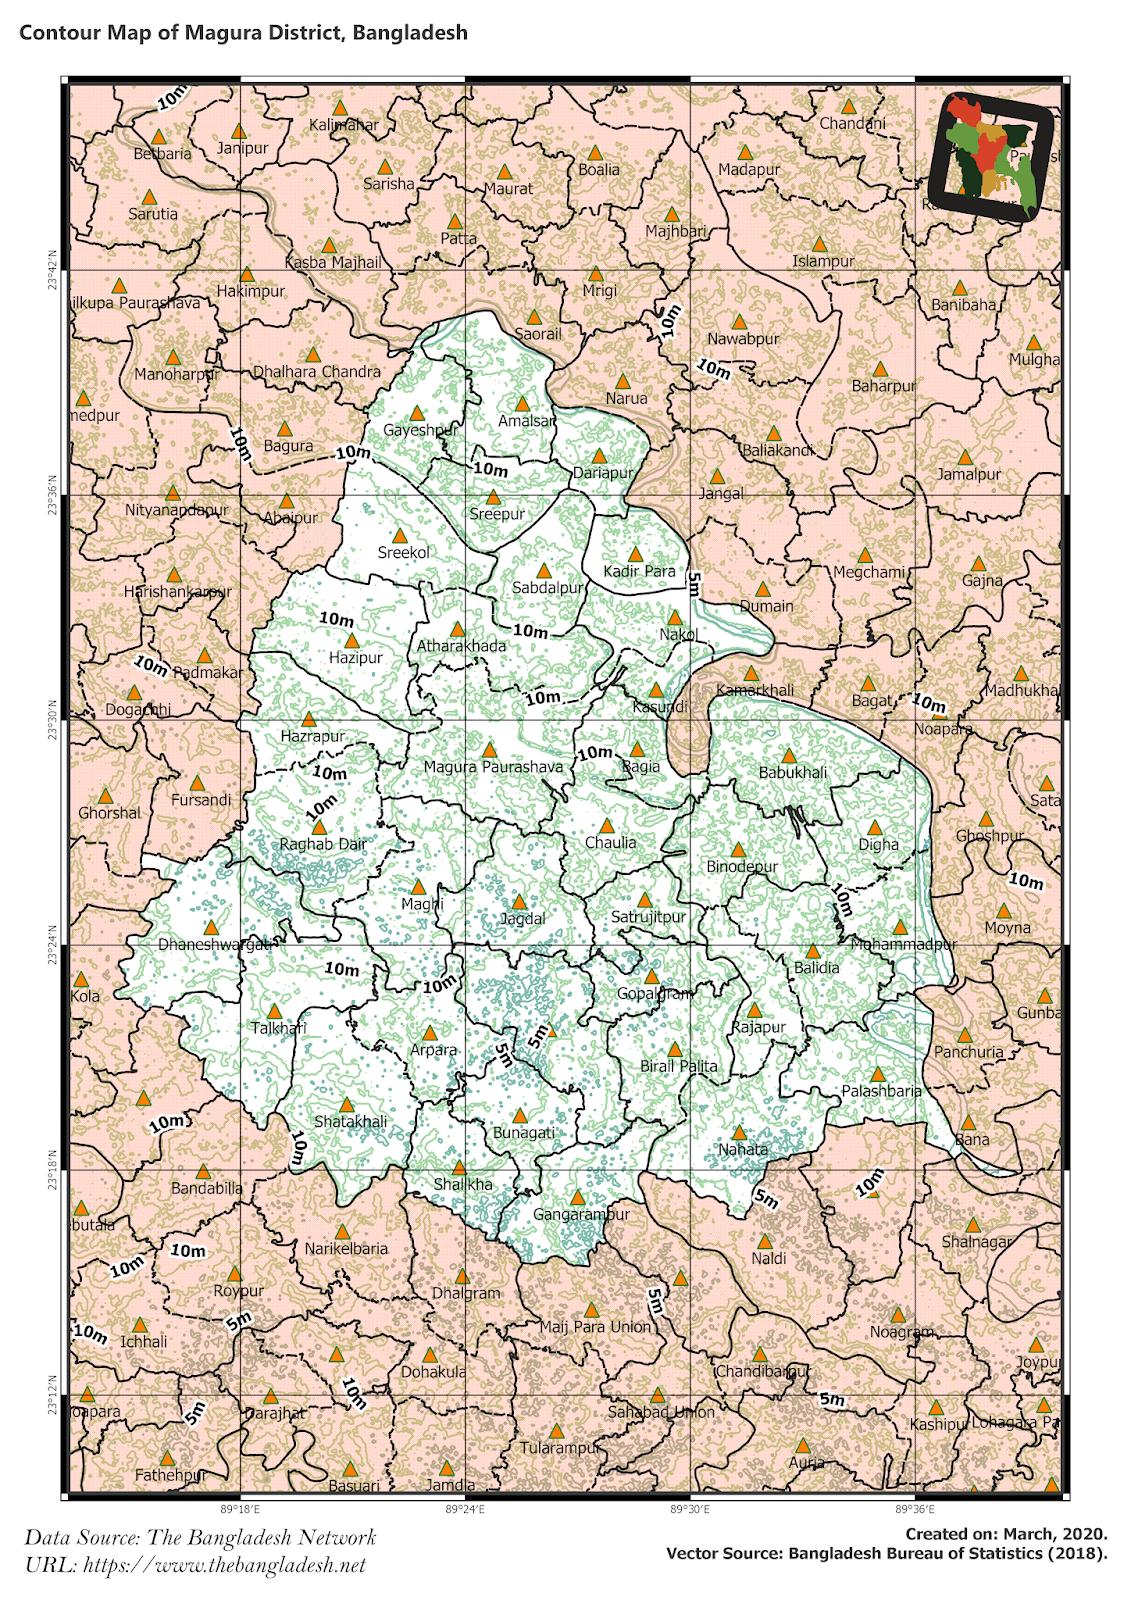 Elevation Map of Magura District of Bangladesh